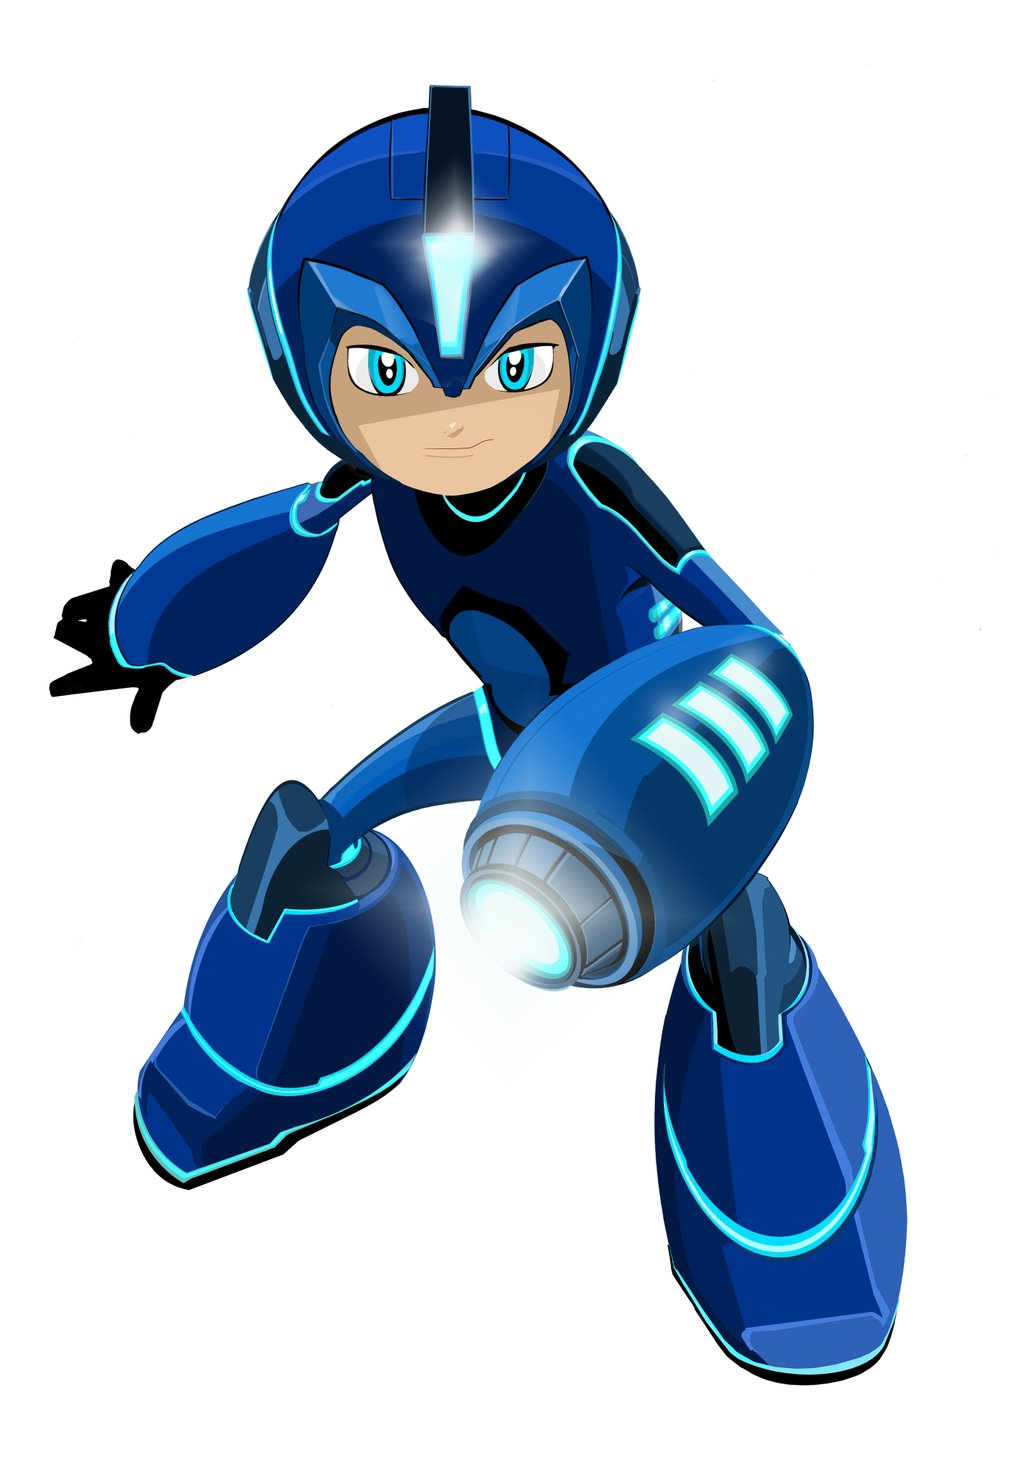 Mega man man of action mmkb fandom powered by wikia - Megaman wikia ...